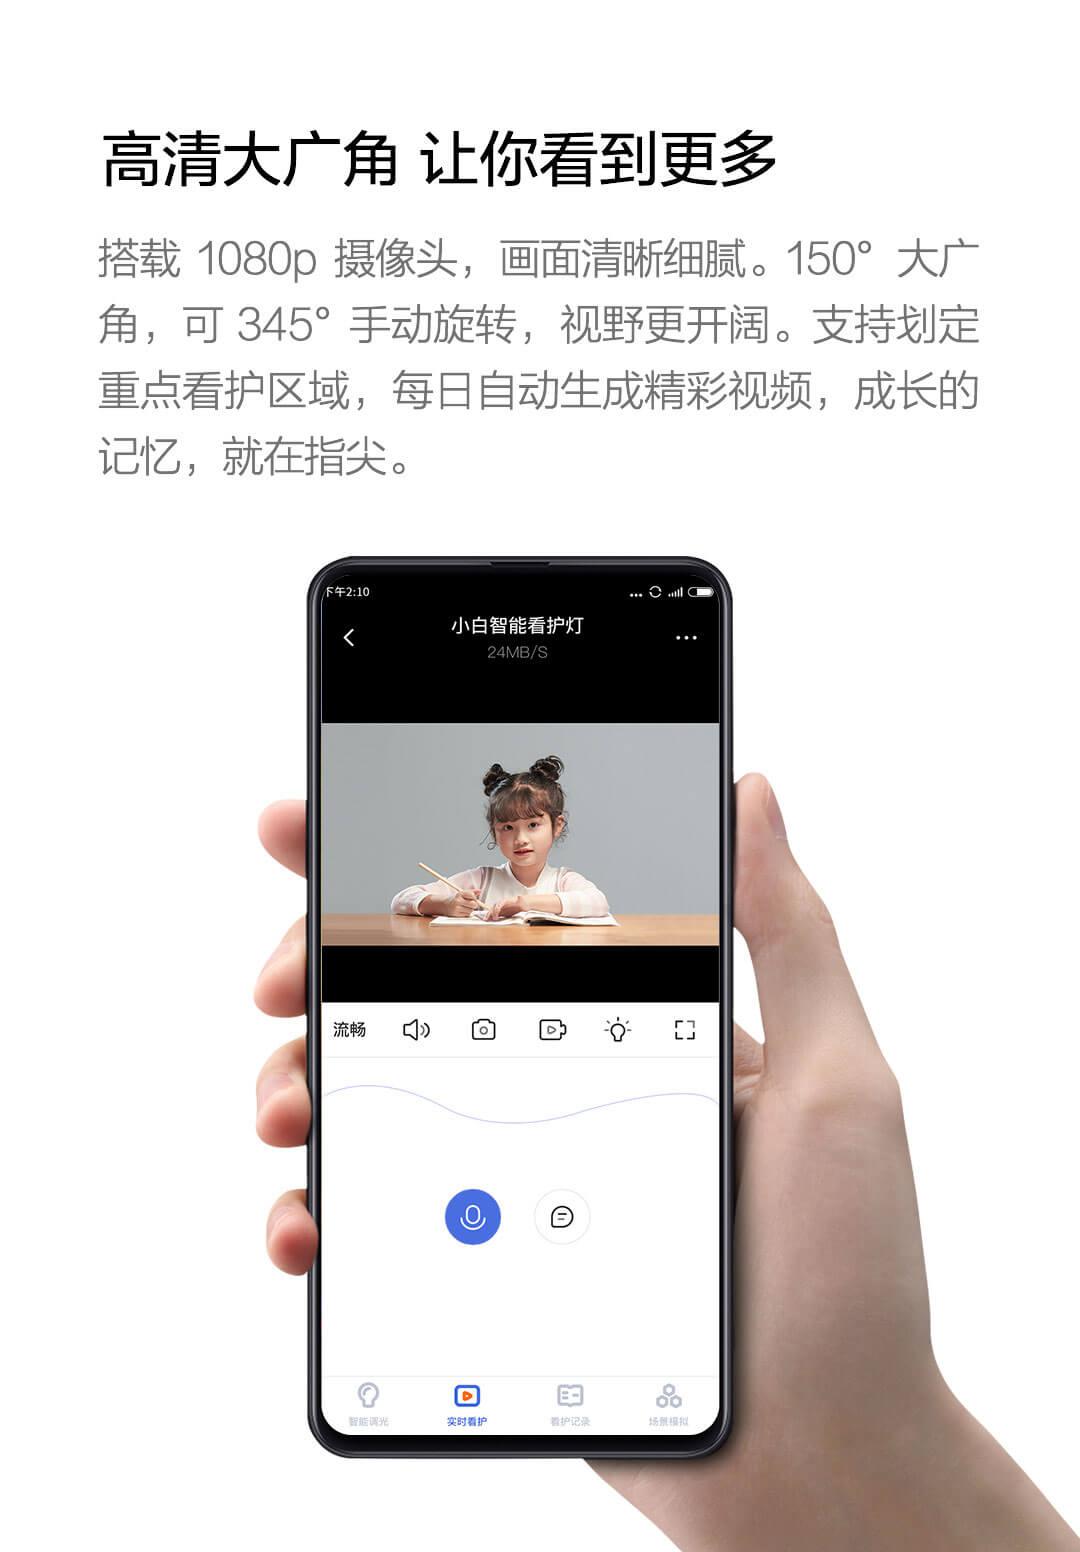 Lámpara de escritorio Xiaomi con cámara y micrófono - Xiaomi News